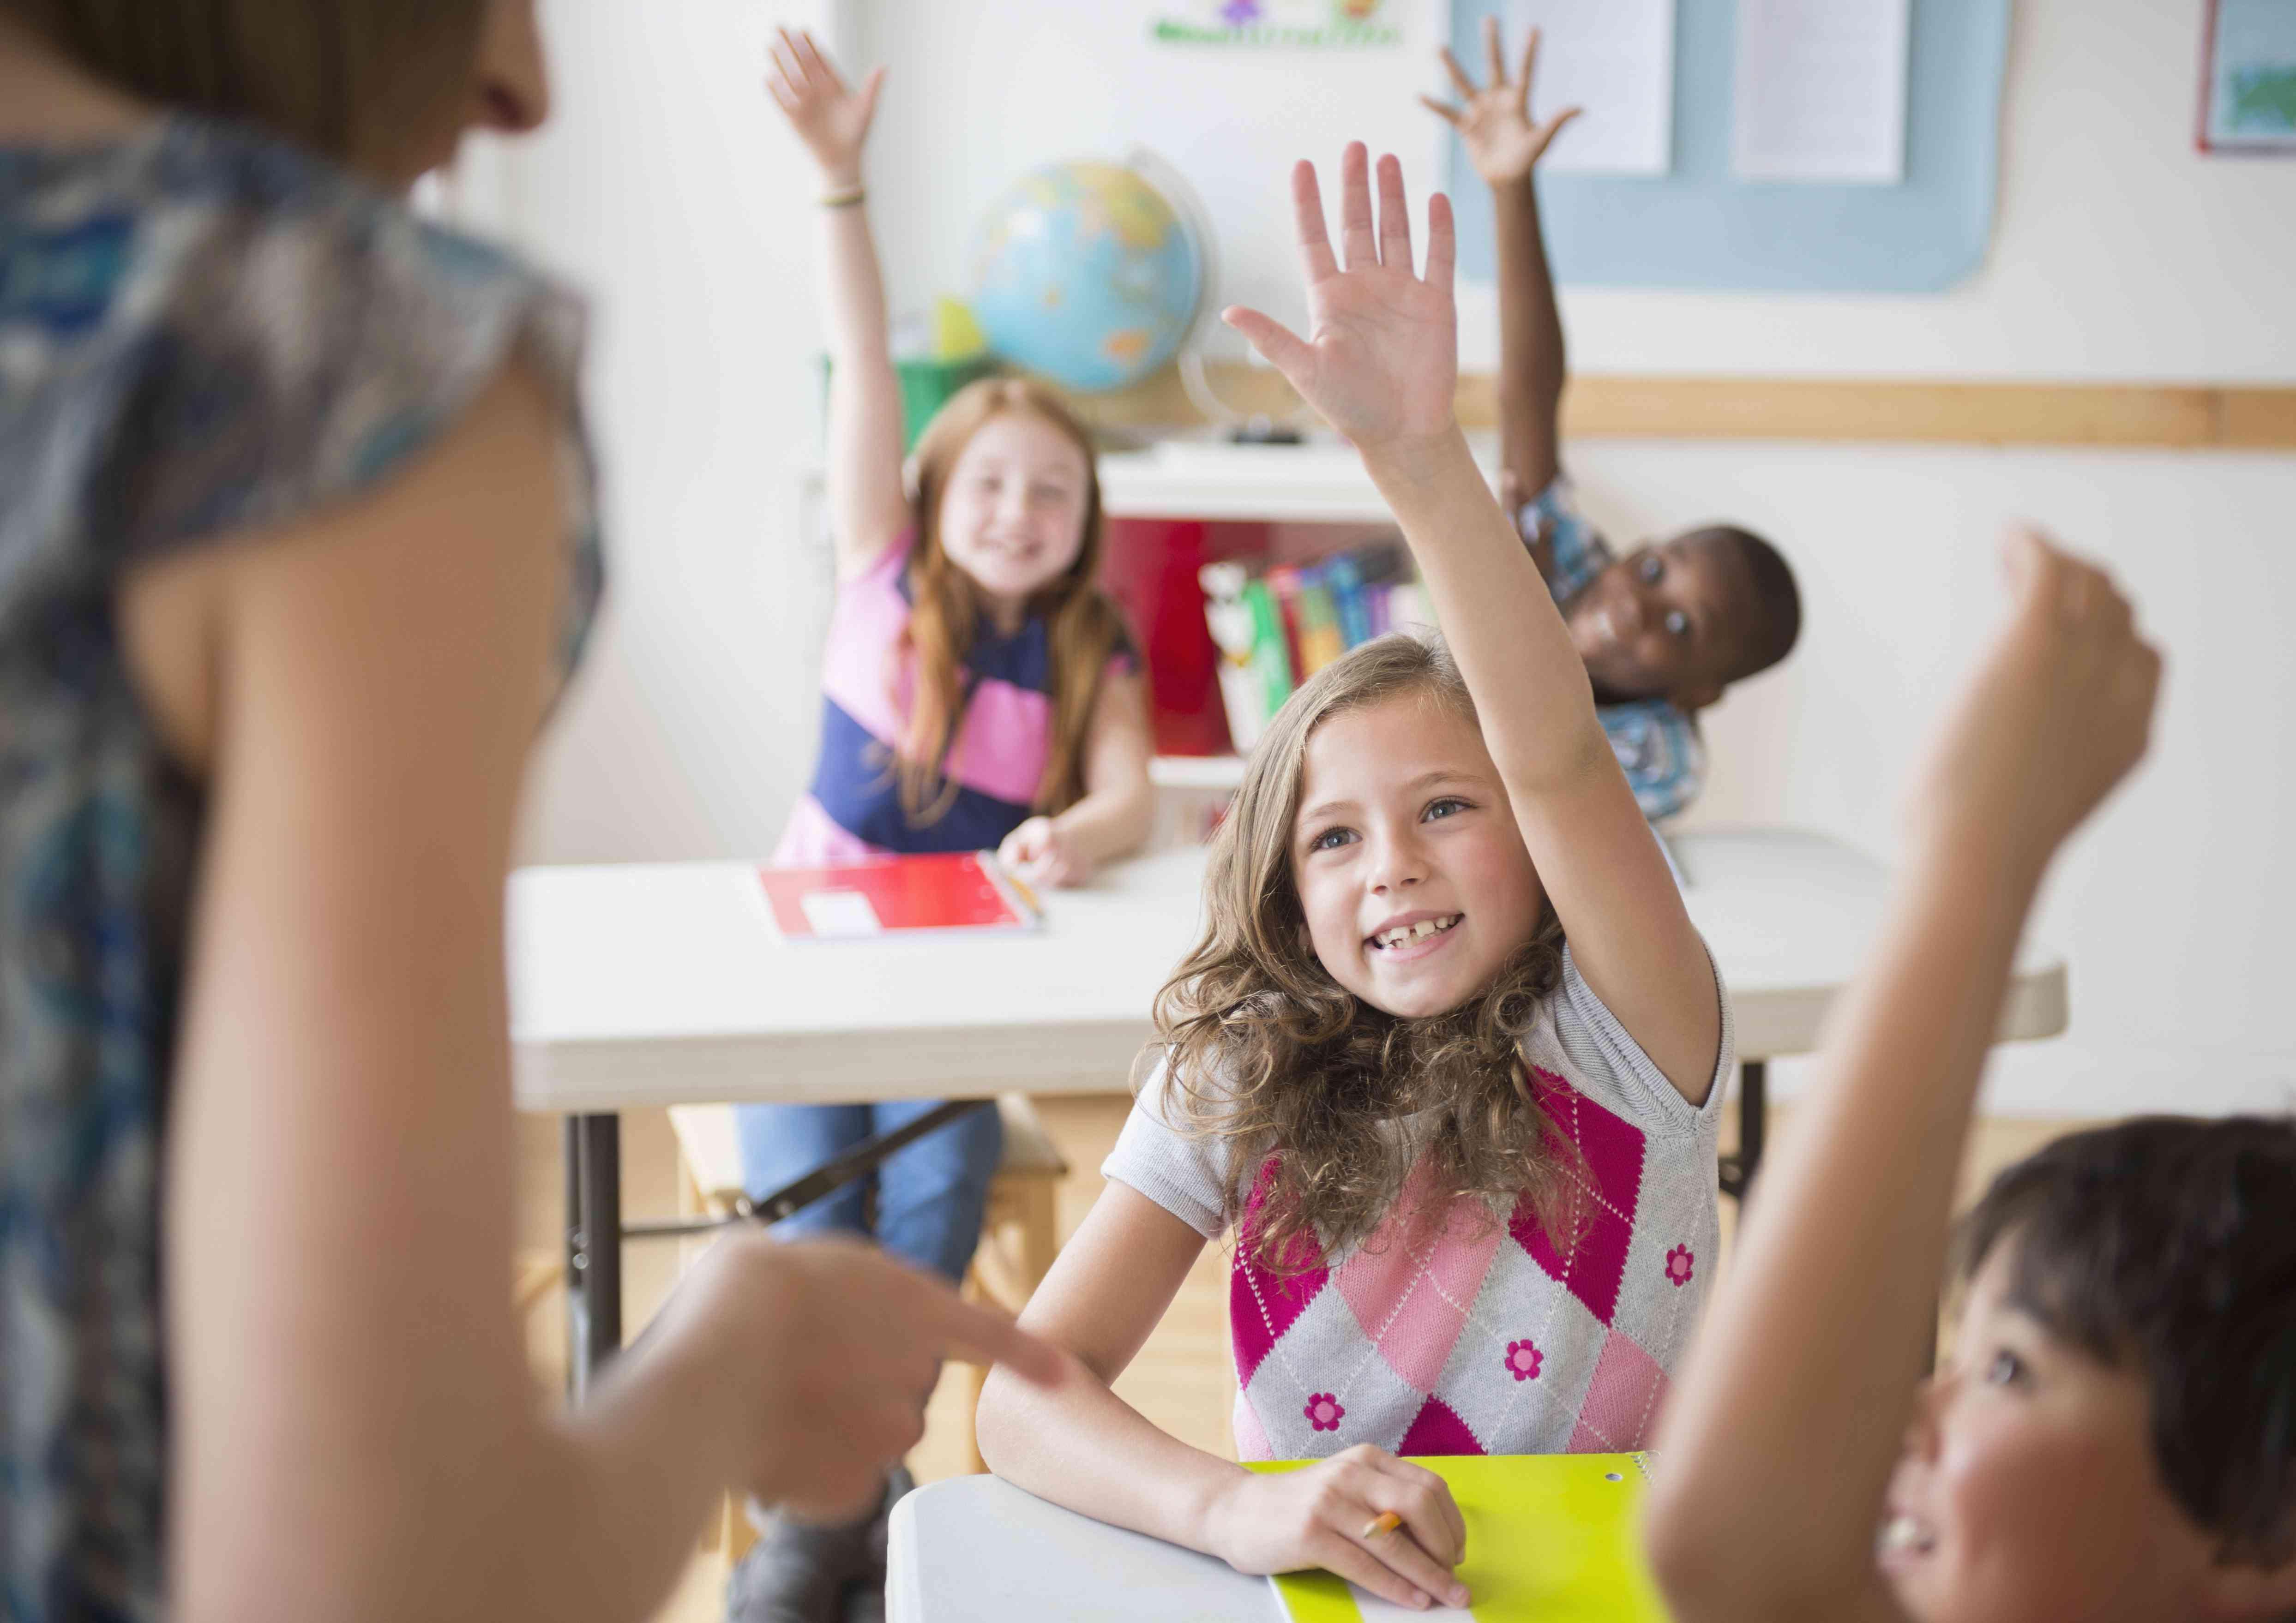 Children raising their hands in a classroom